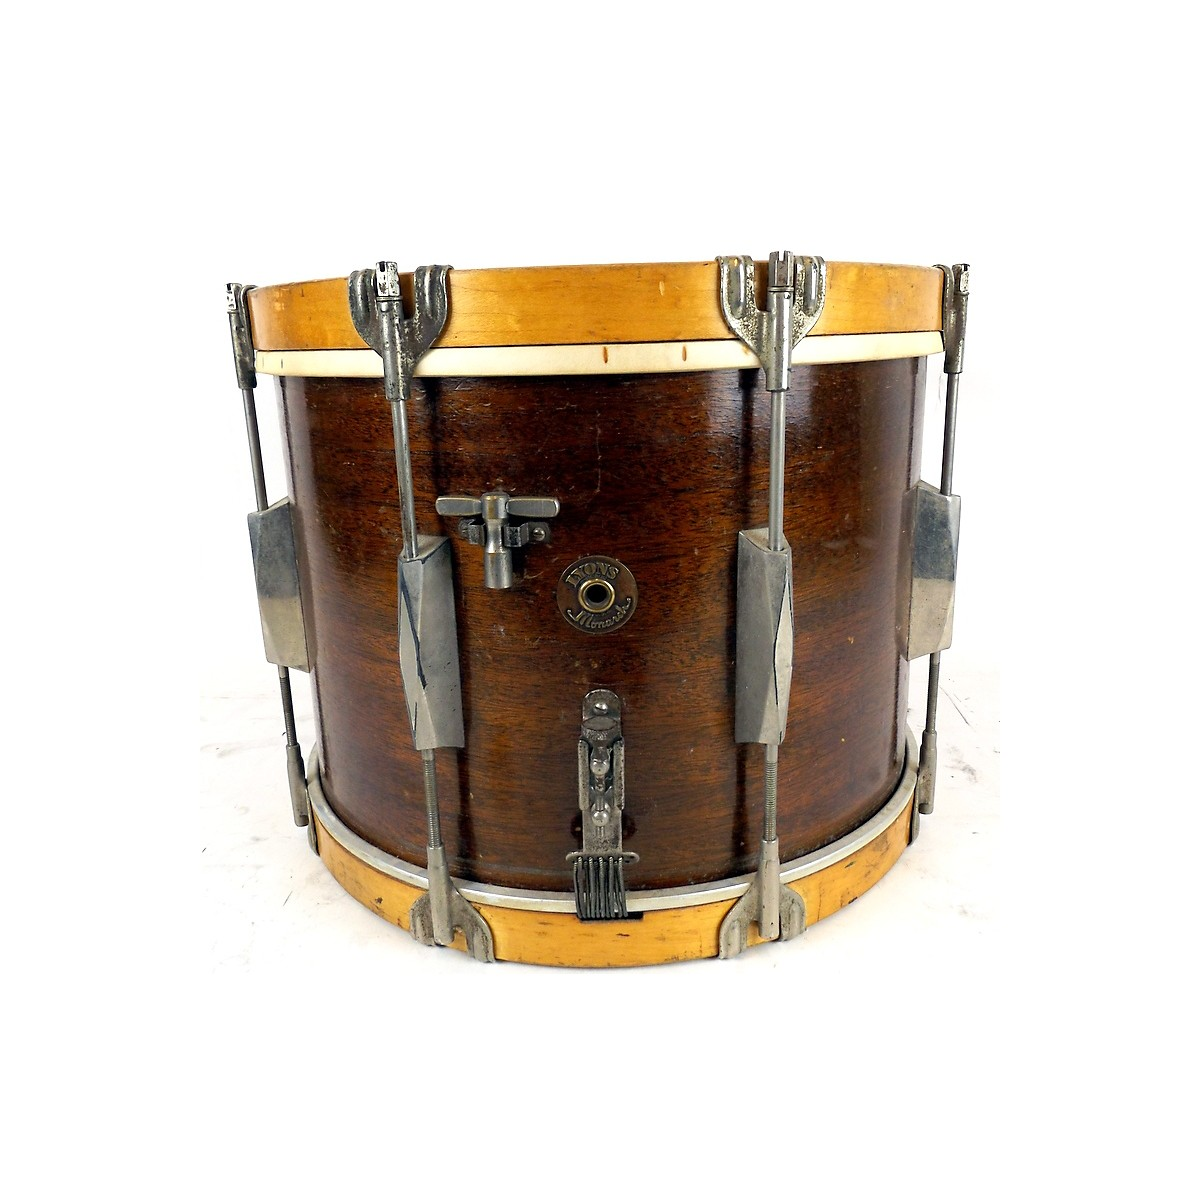 Slingerland 1960s 12X15 Marching Snare Drum